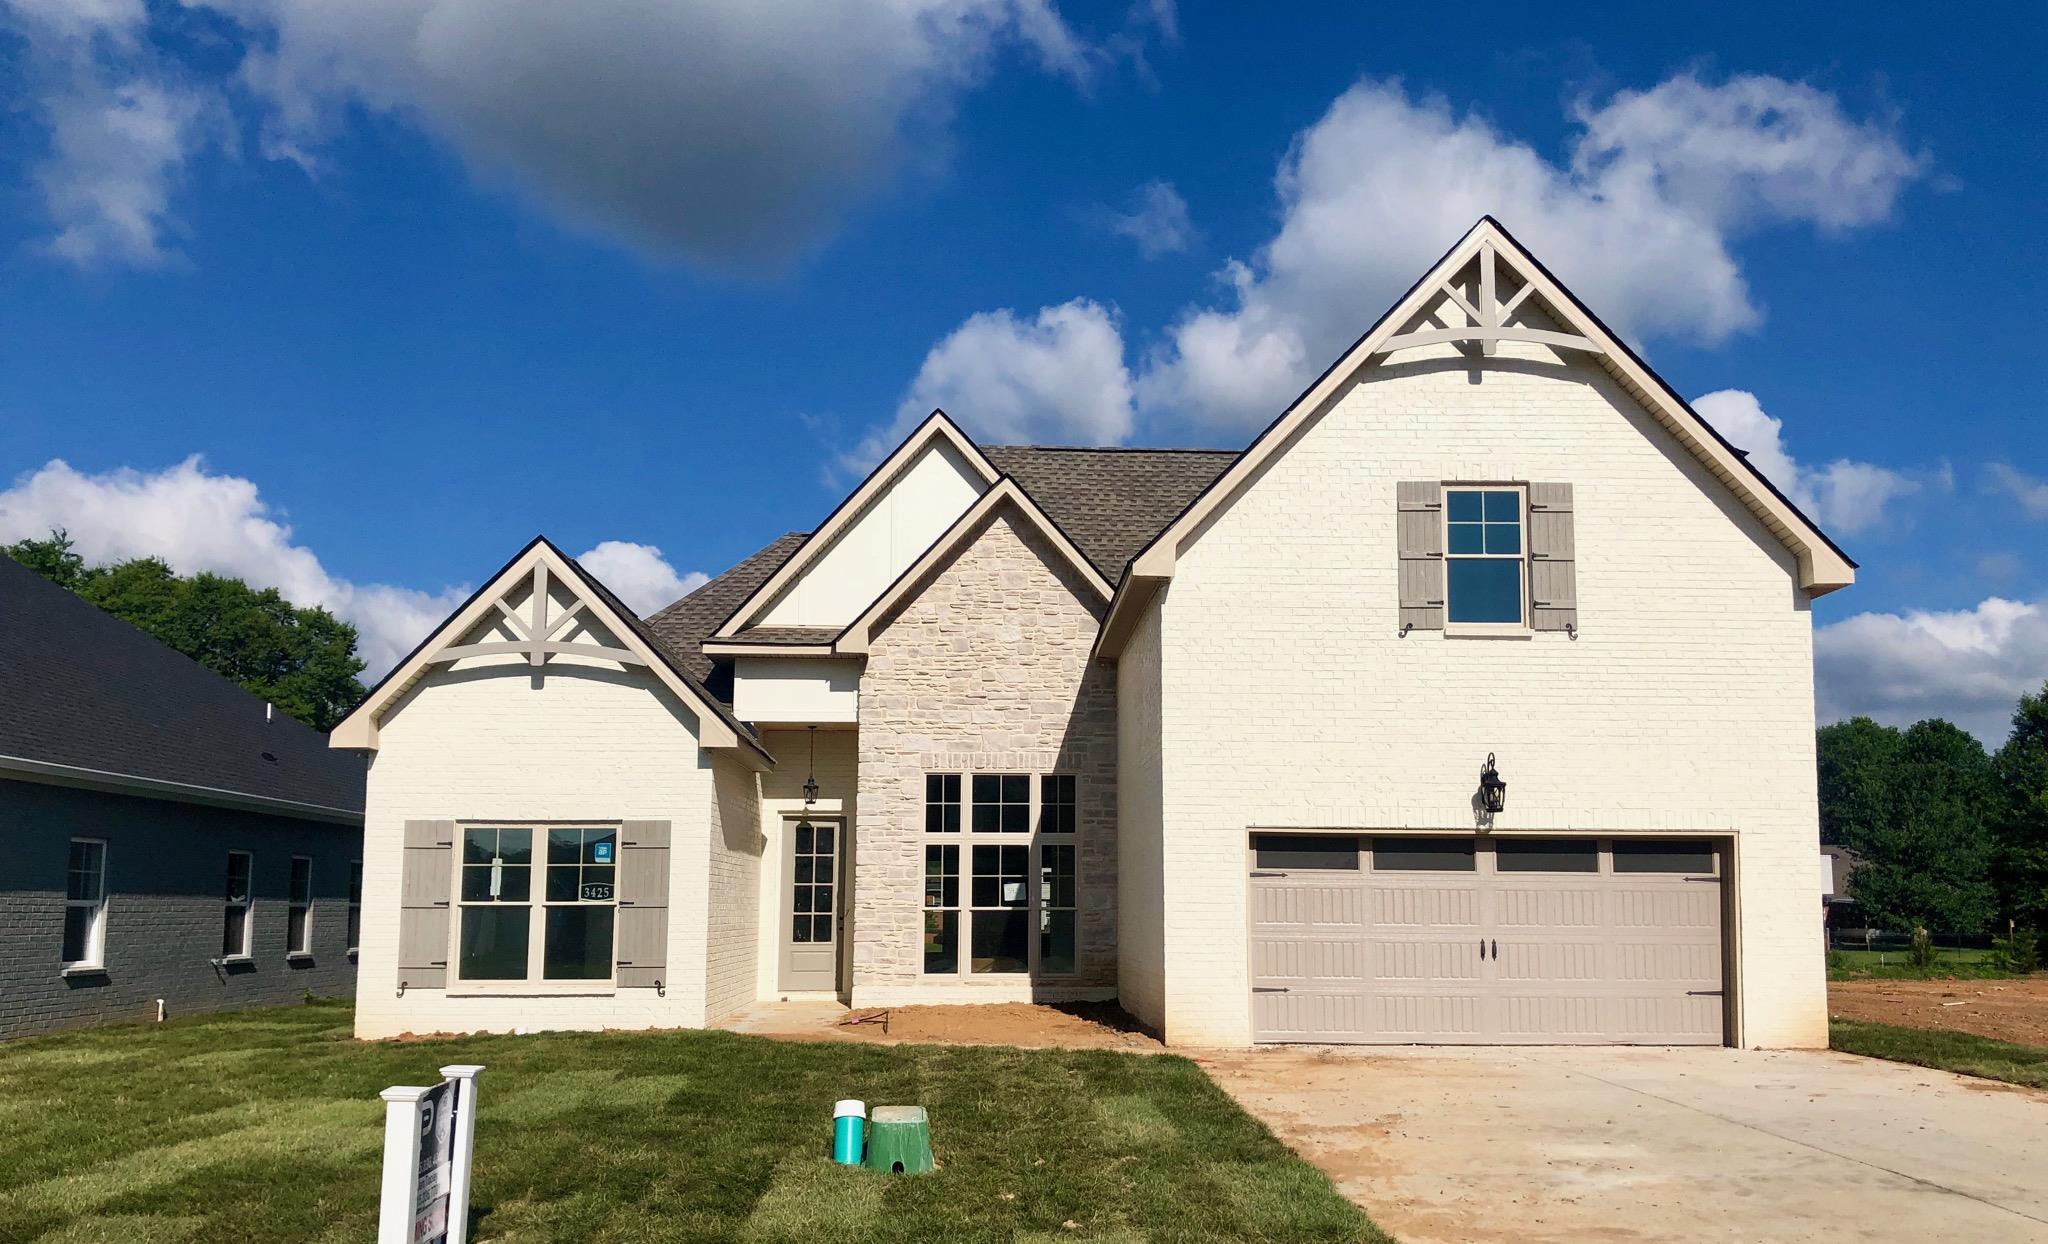 3425 Pershing Dr., Murfreesboro, TN 37129 - Murfreesboro, TN real estate listing